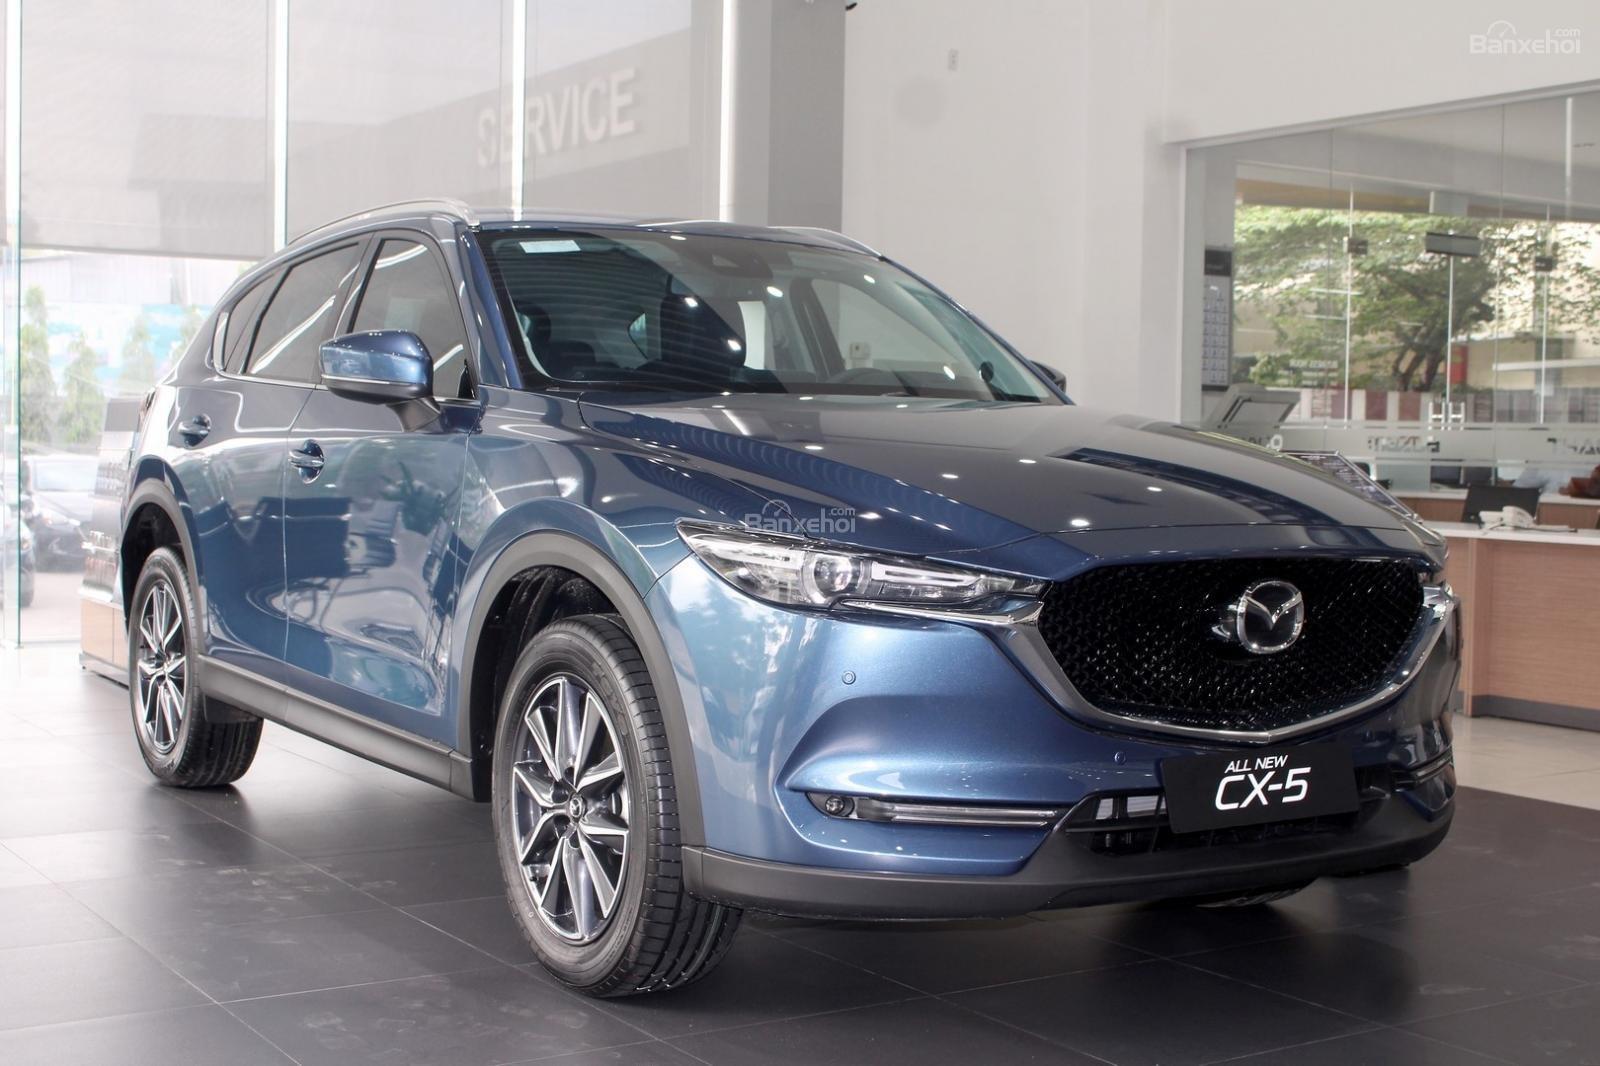 [Mazda Bình Triệu] Mazda CX-5 2019, LH 0941322979 giảm ngay 50 triệu, giá xe Mazda tốt nhất (2)